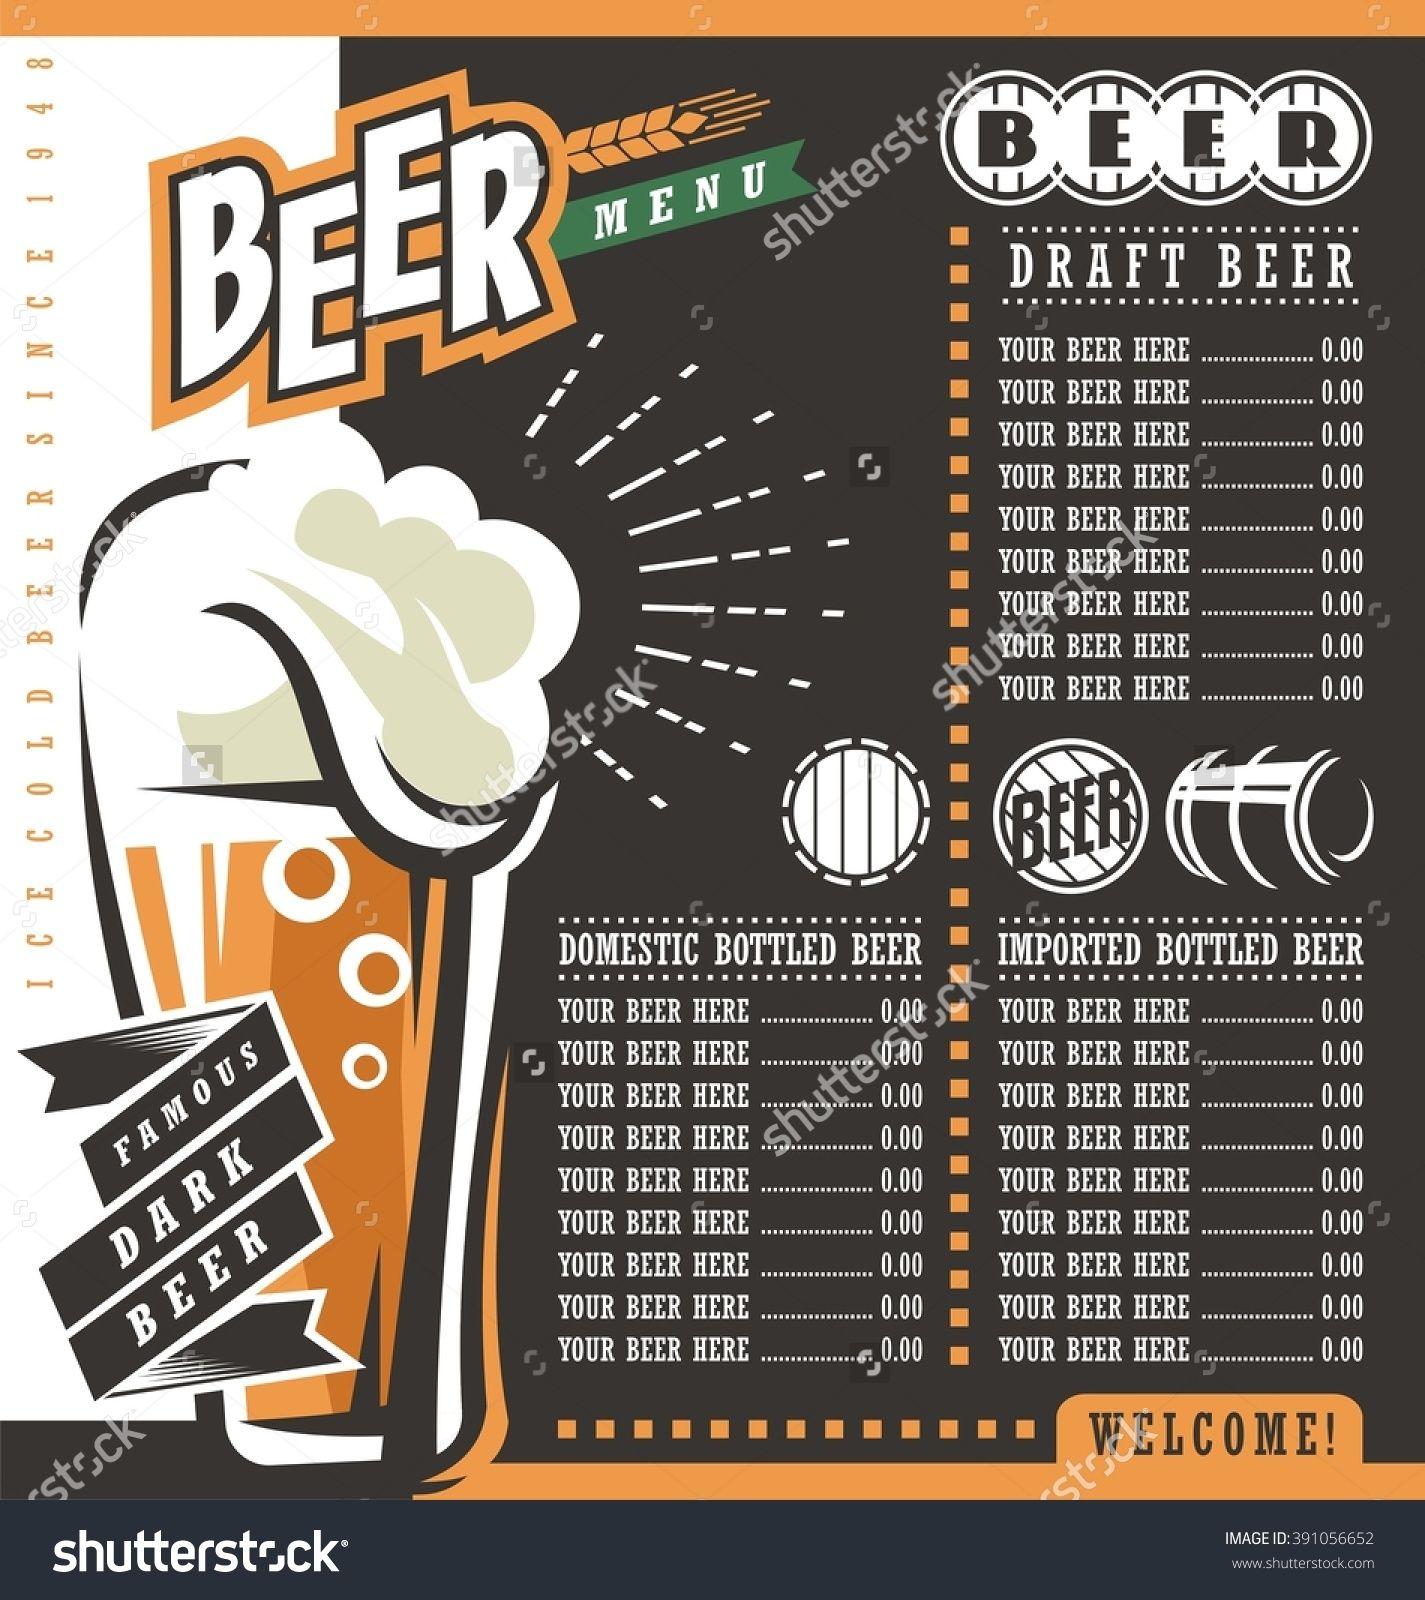 Beer Menu Retro Design Template. Pub Price List With Famous Dark Beer.